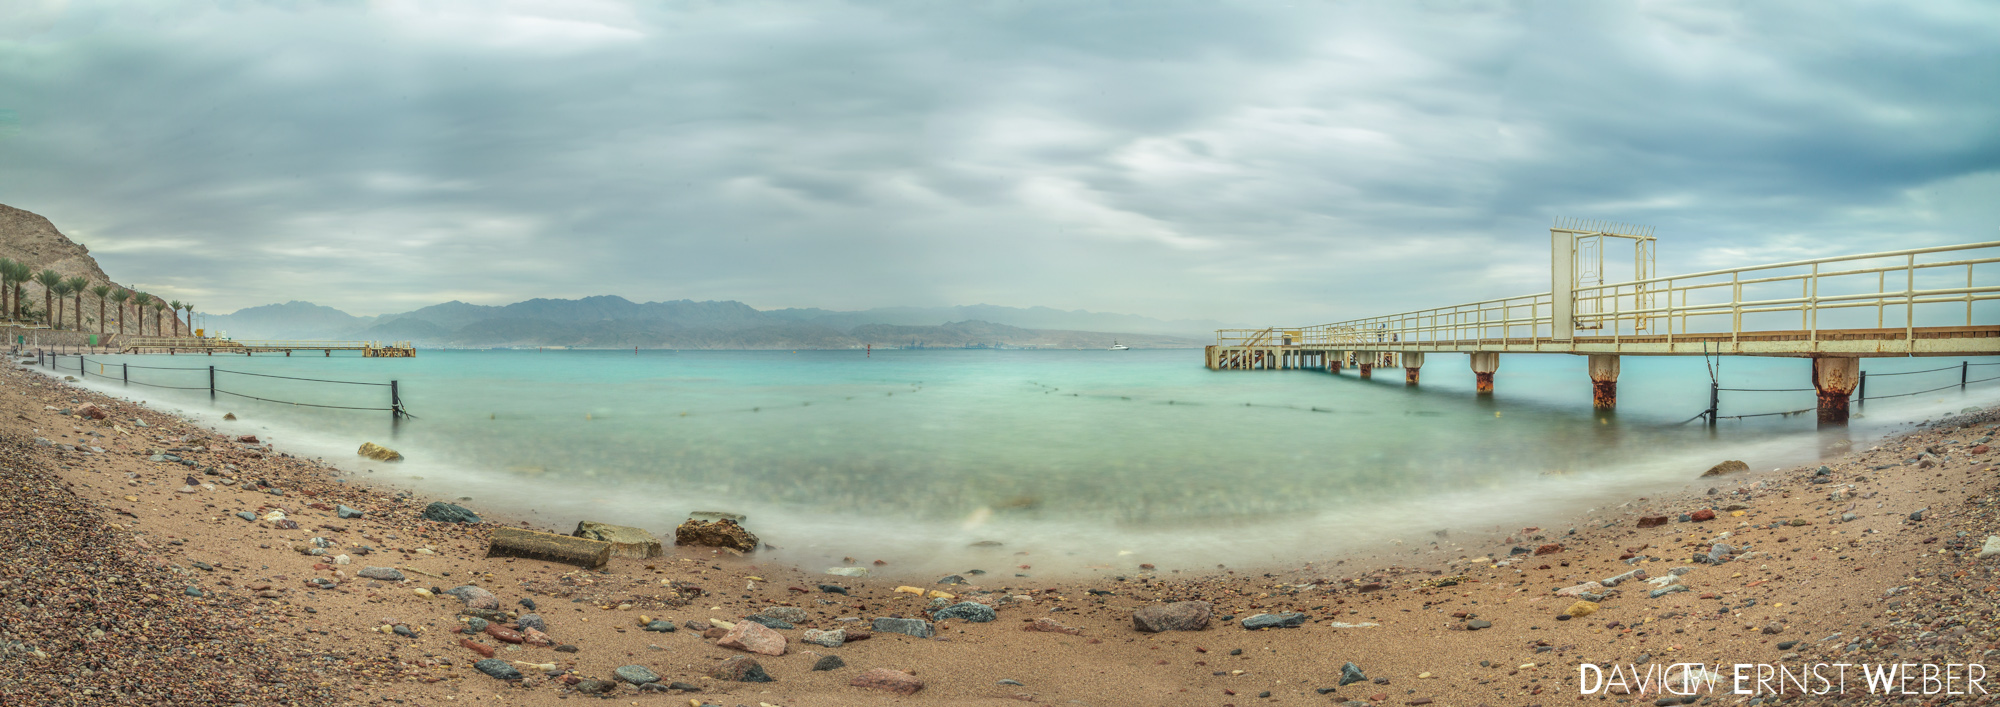 Eilat - Rotes Meer